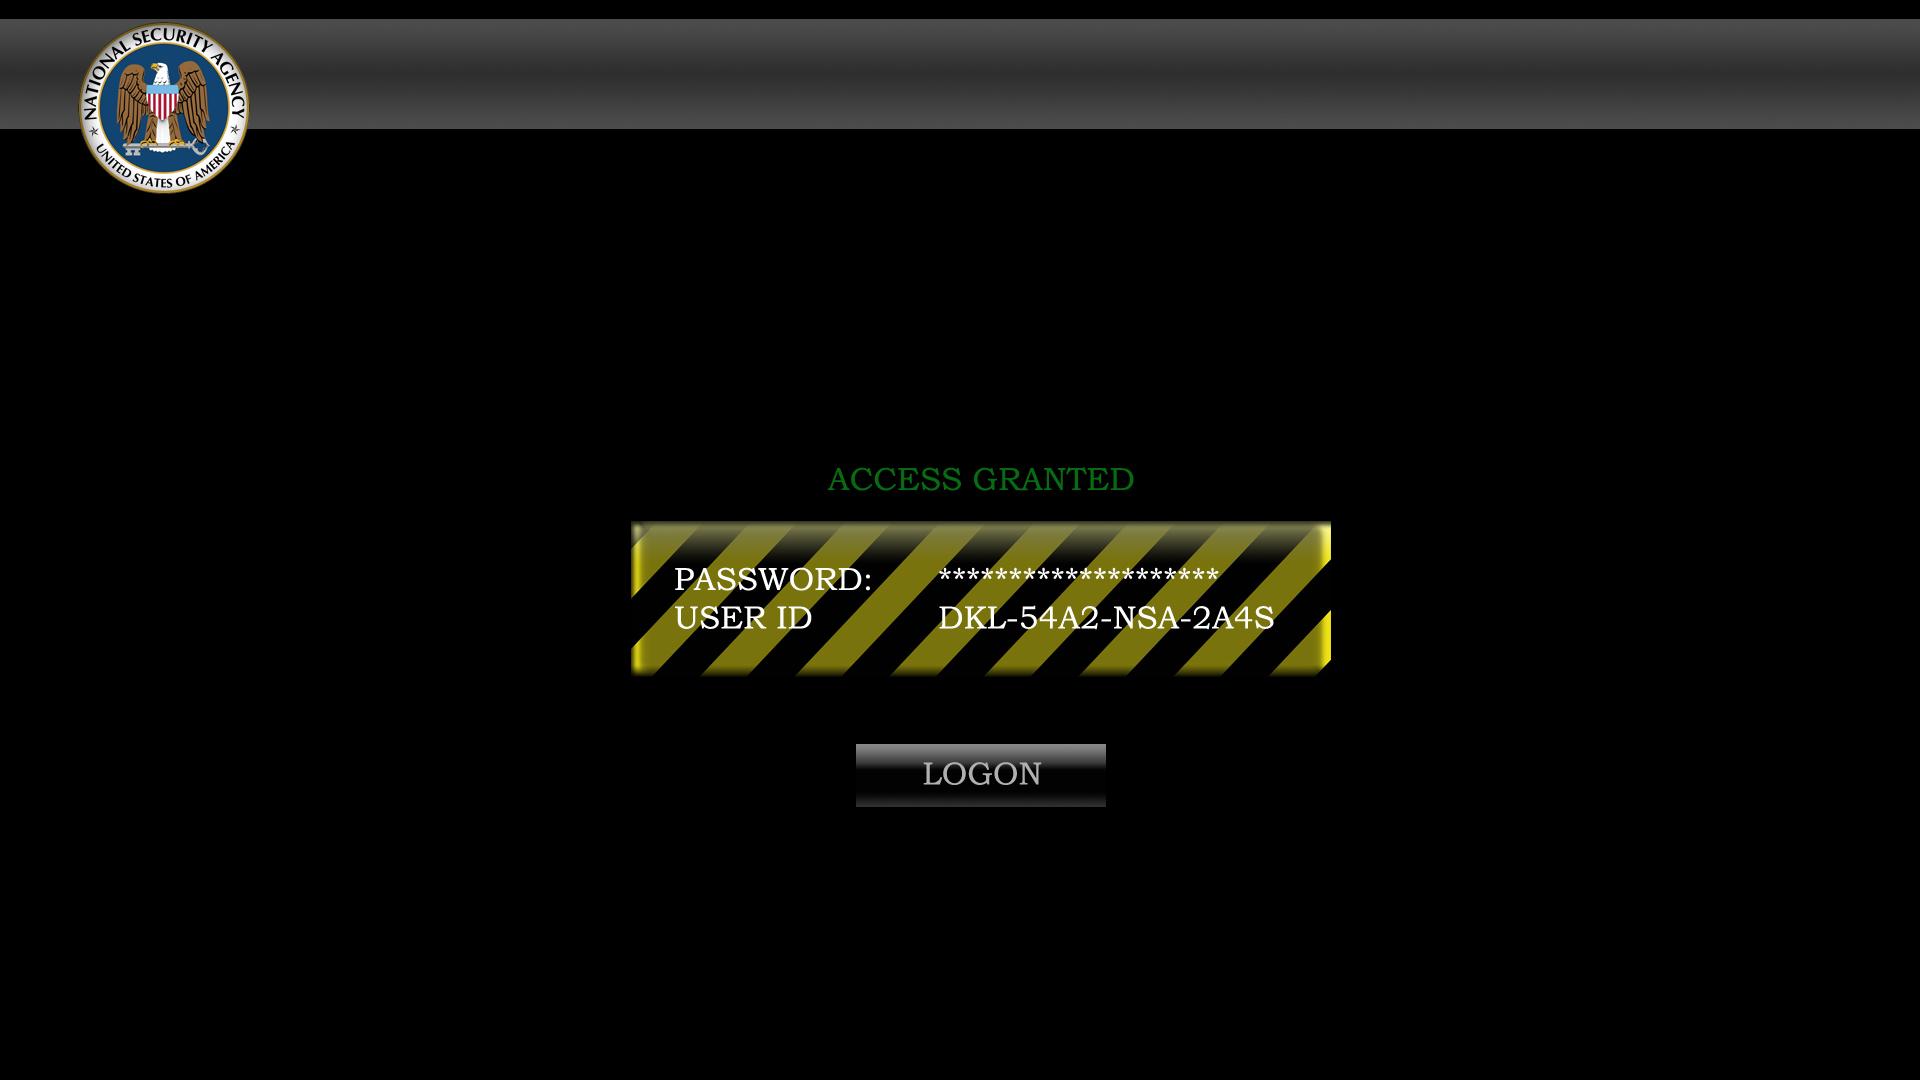 Free Animated Fall Wallpaper National Security Agency Wallpaper Hd Pixelstalk Net